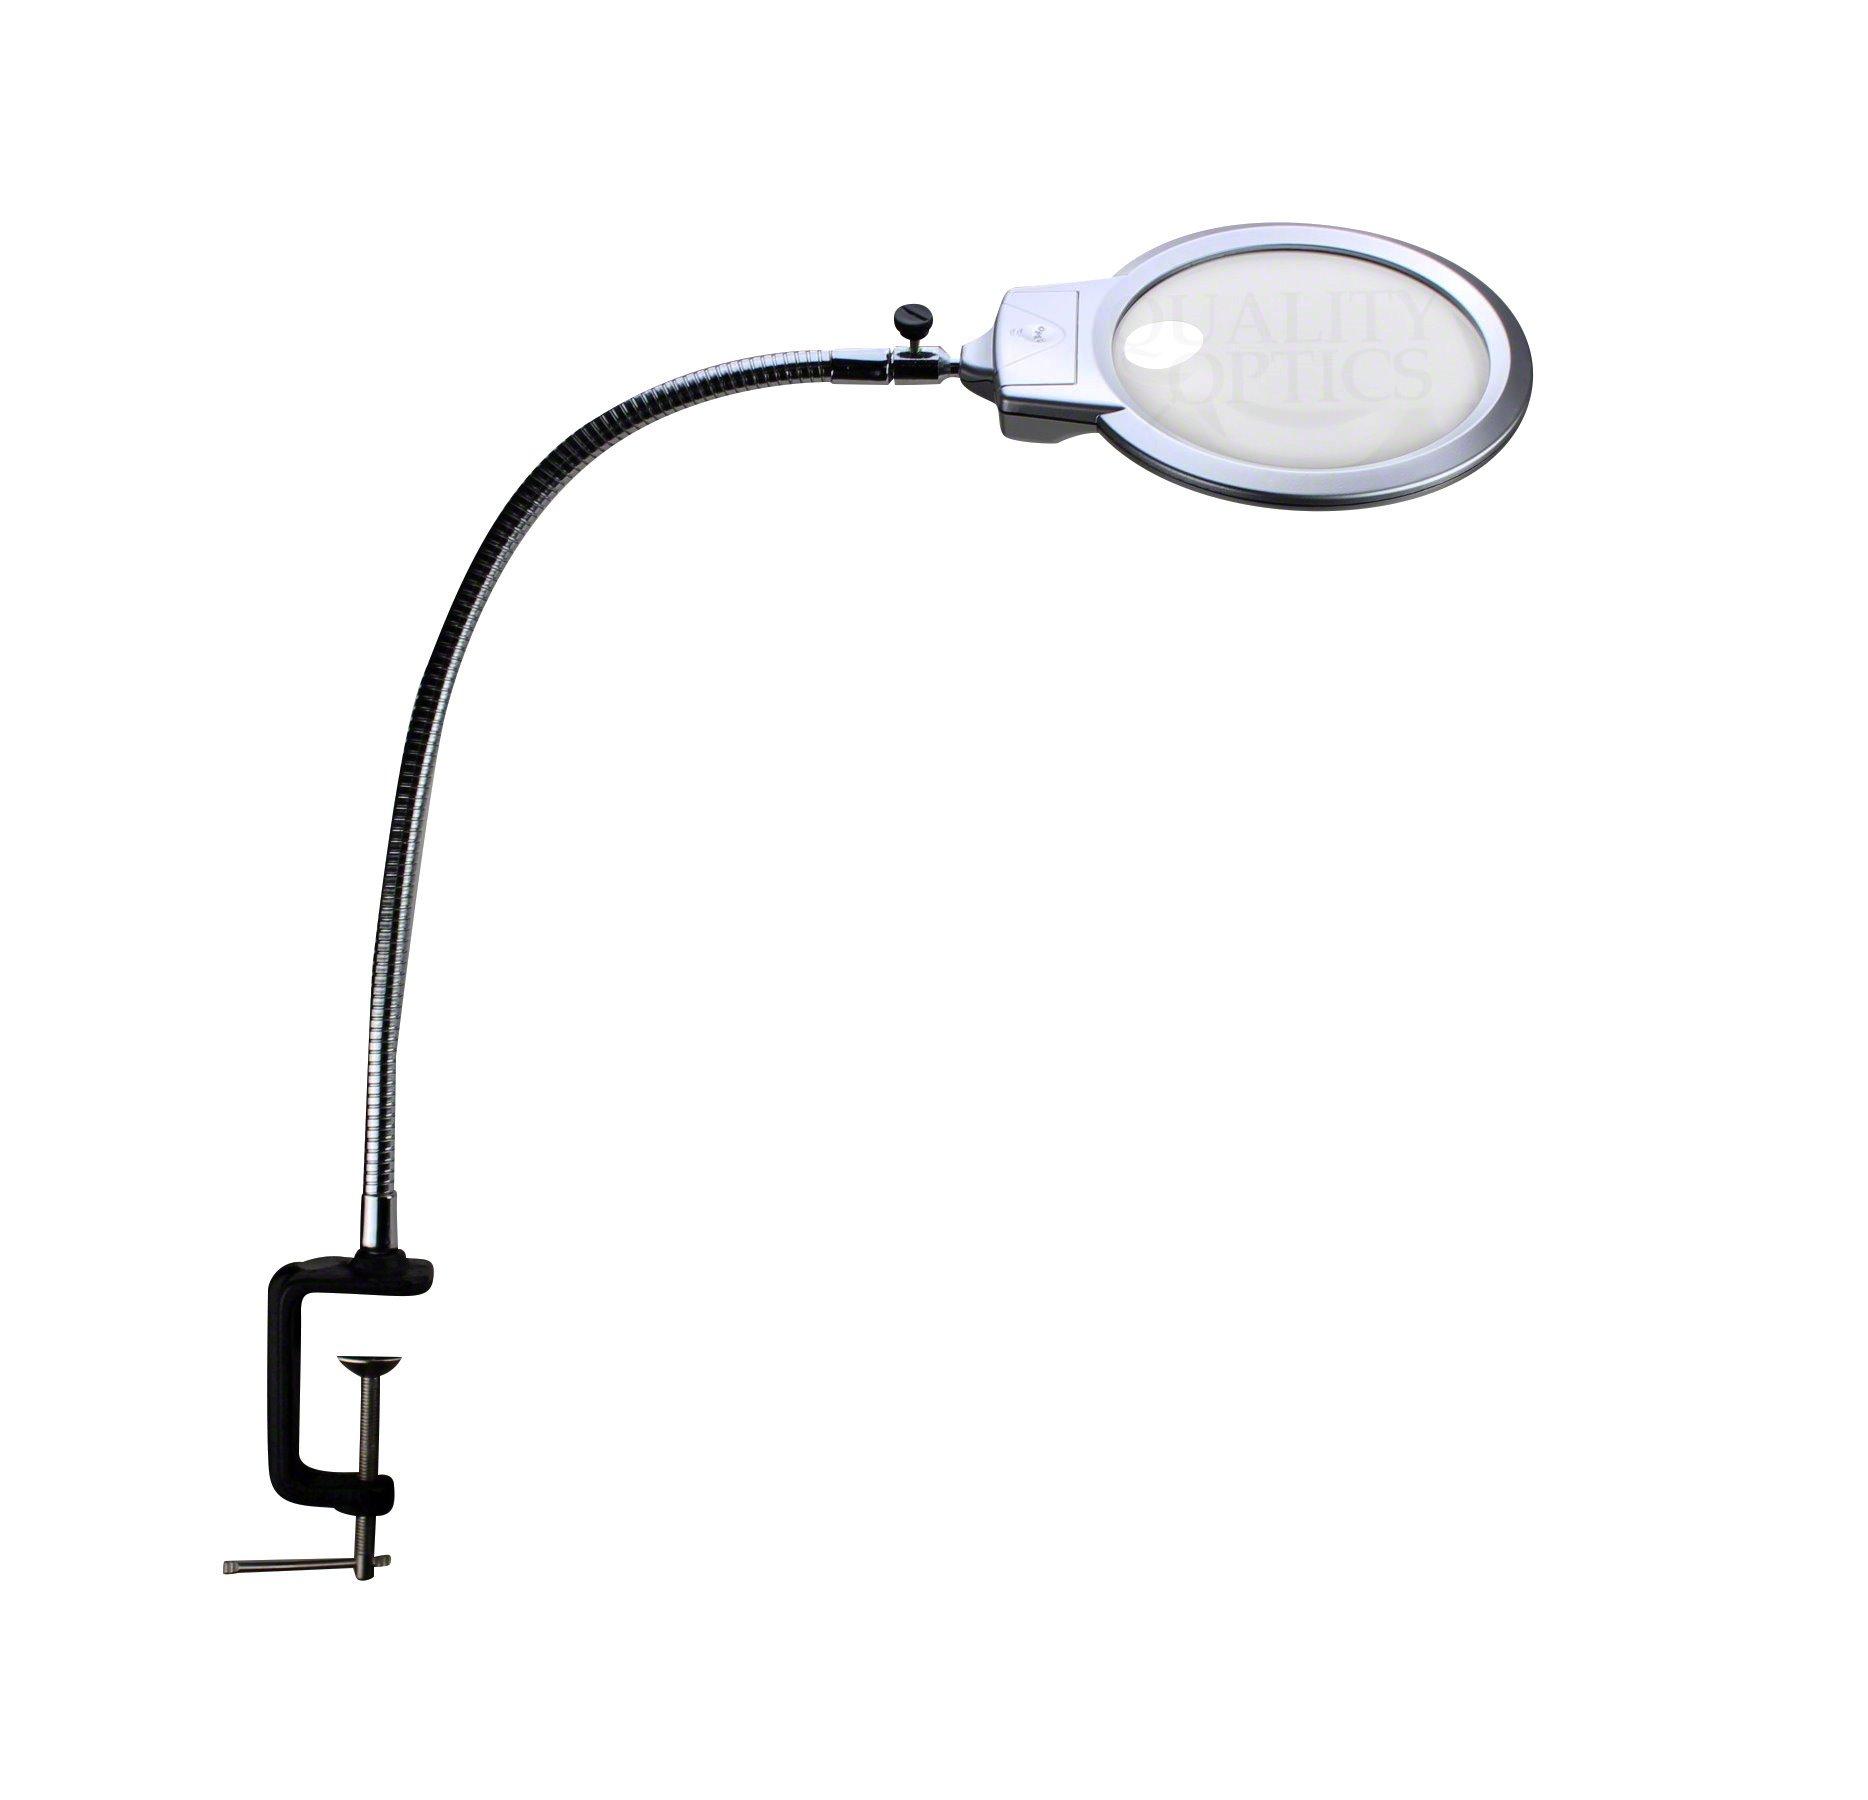 Quality Optics Illuminated Desk Mount Magnifying Glass Magnifier Led Light USA XL Metal Clamp